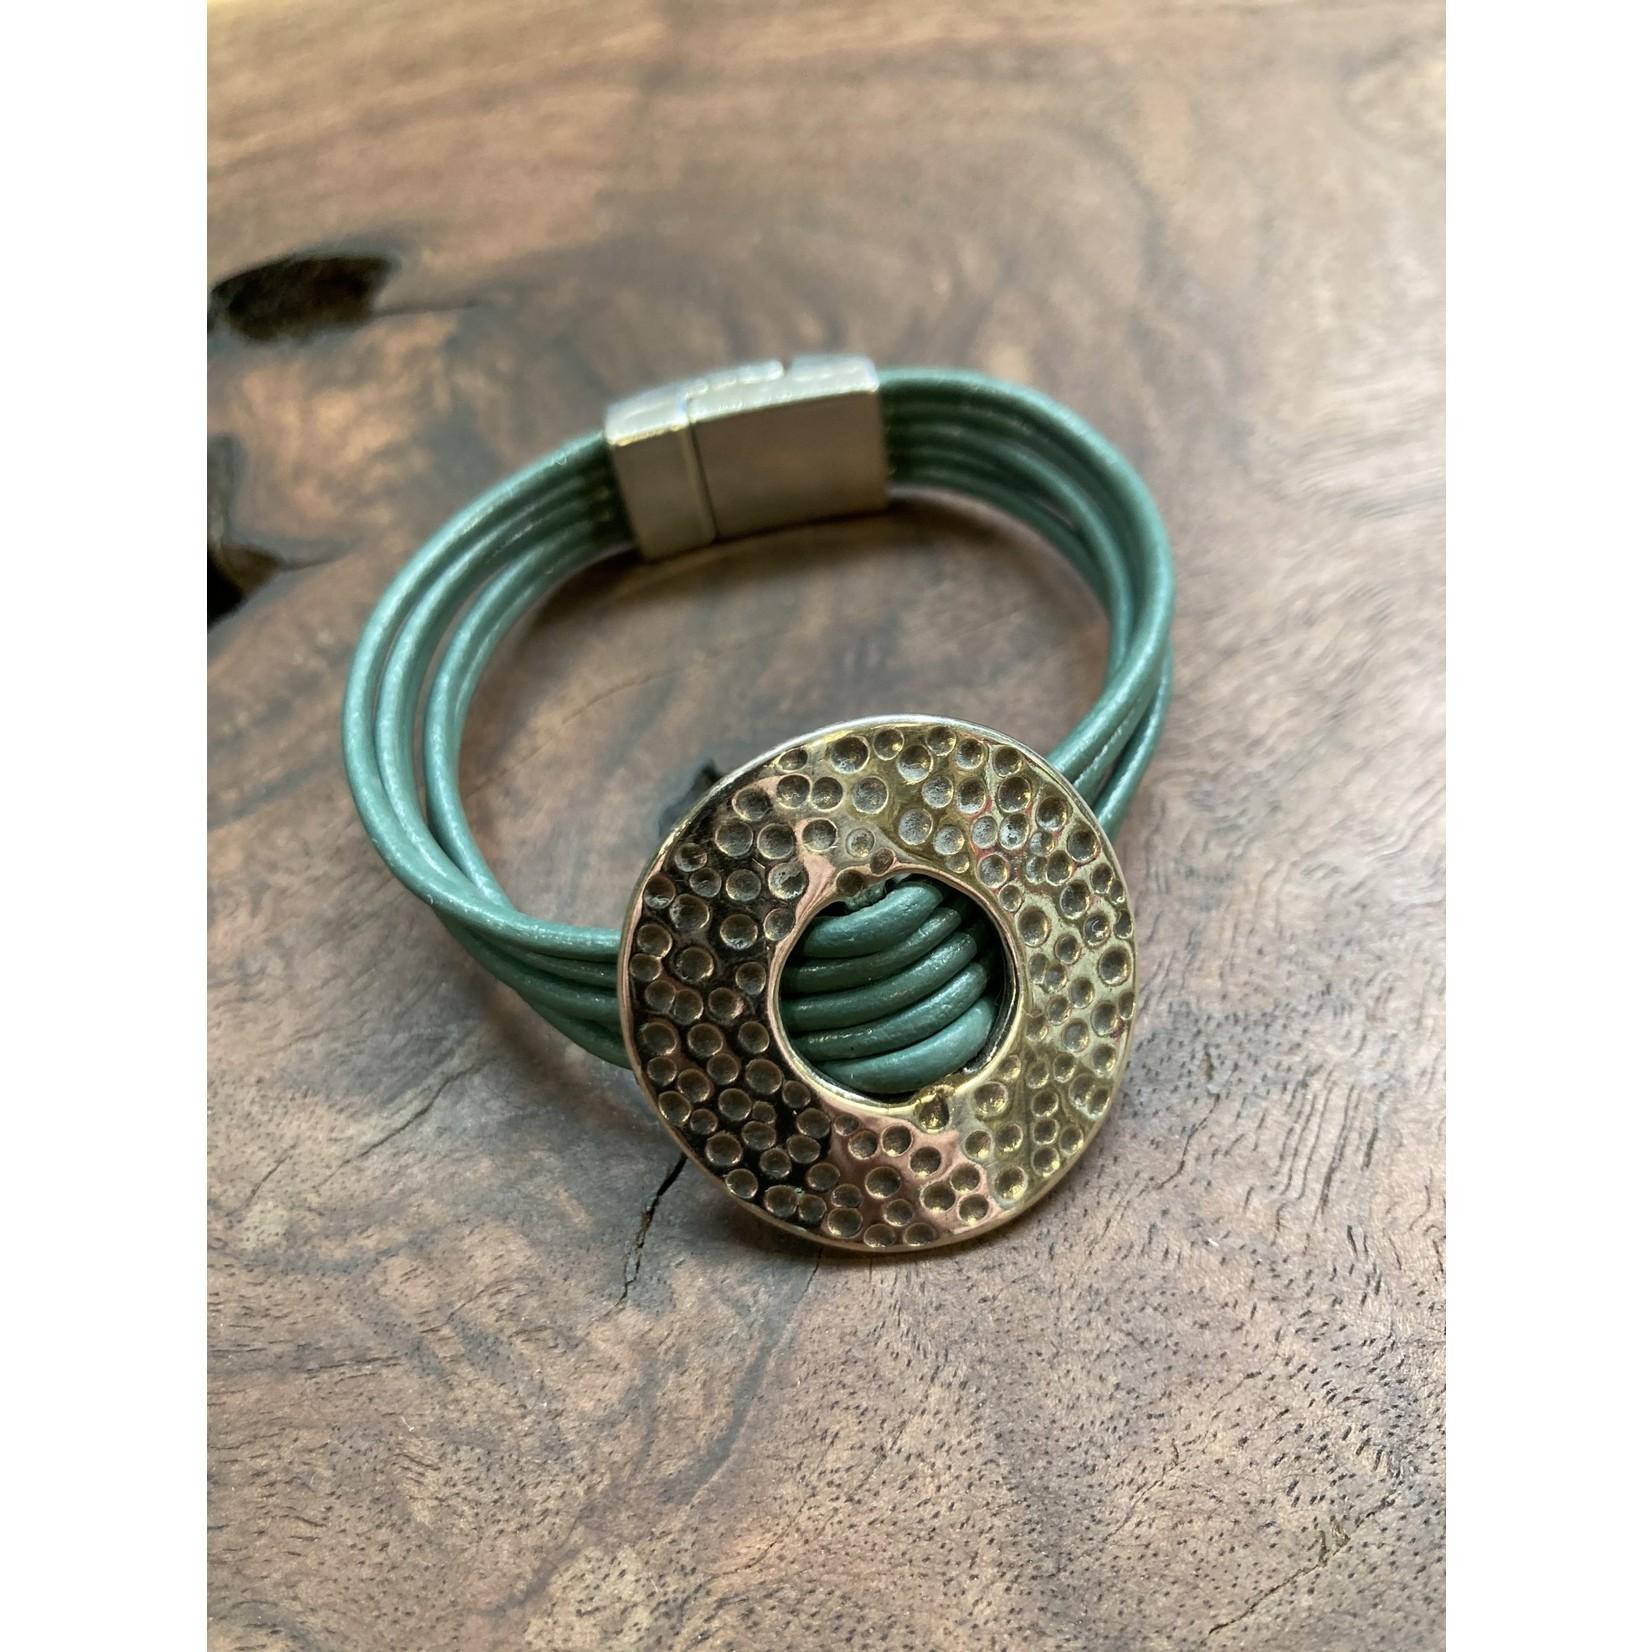 Allie Bonidy Allie B  Teal Leather bracelet with hammered circle